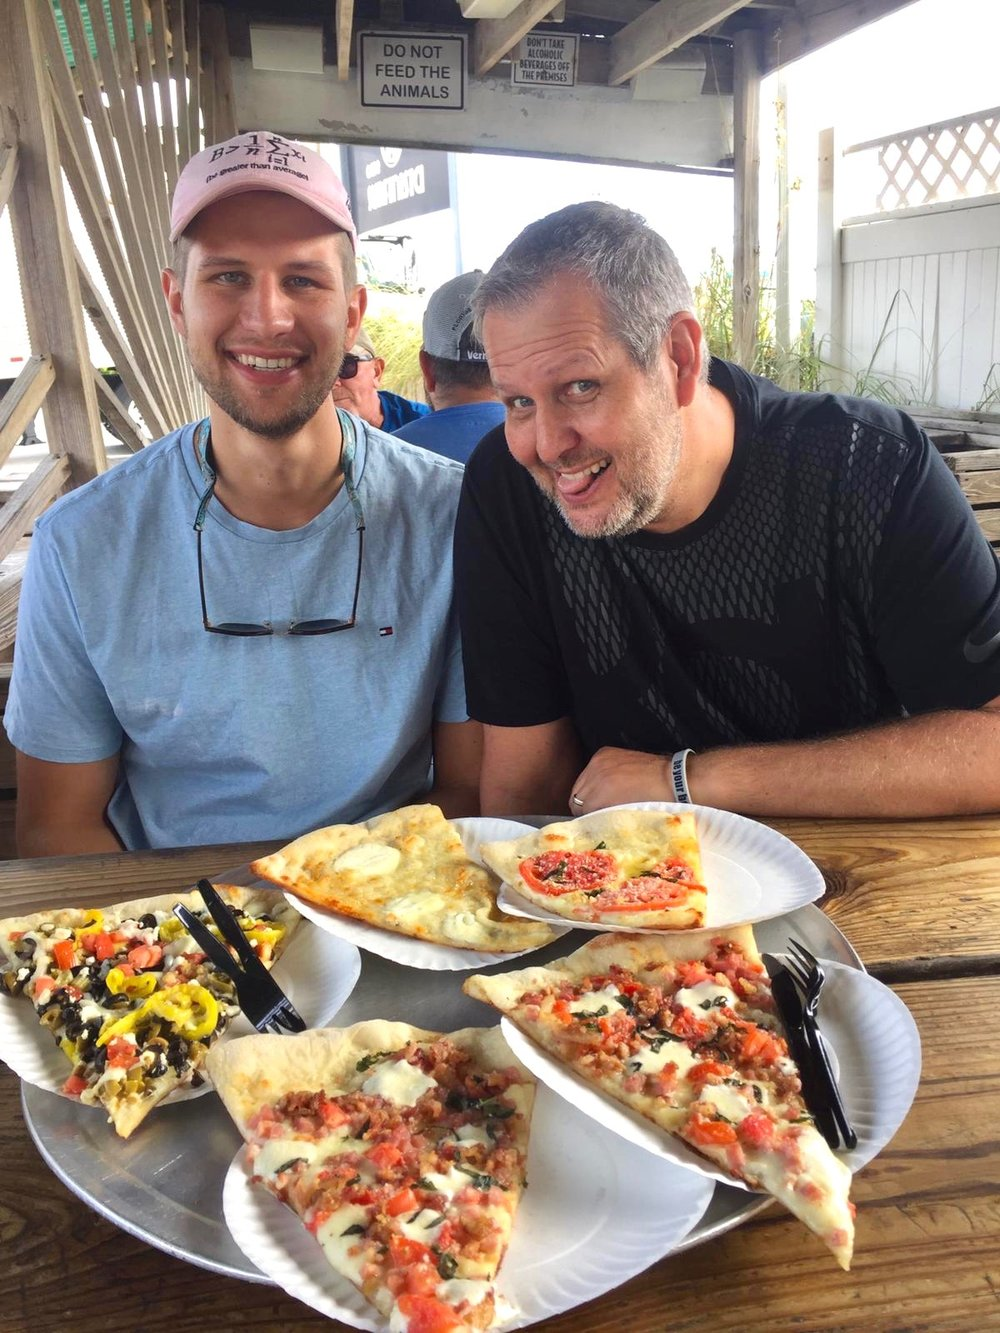 andrzej and his father, Mariusz Kolaczewski, enjoying lunch at  The Original Bizzarro Famous NY Pizza  in indialantic, florida.